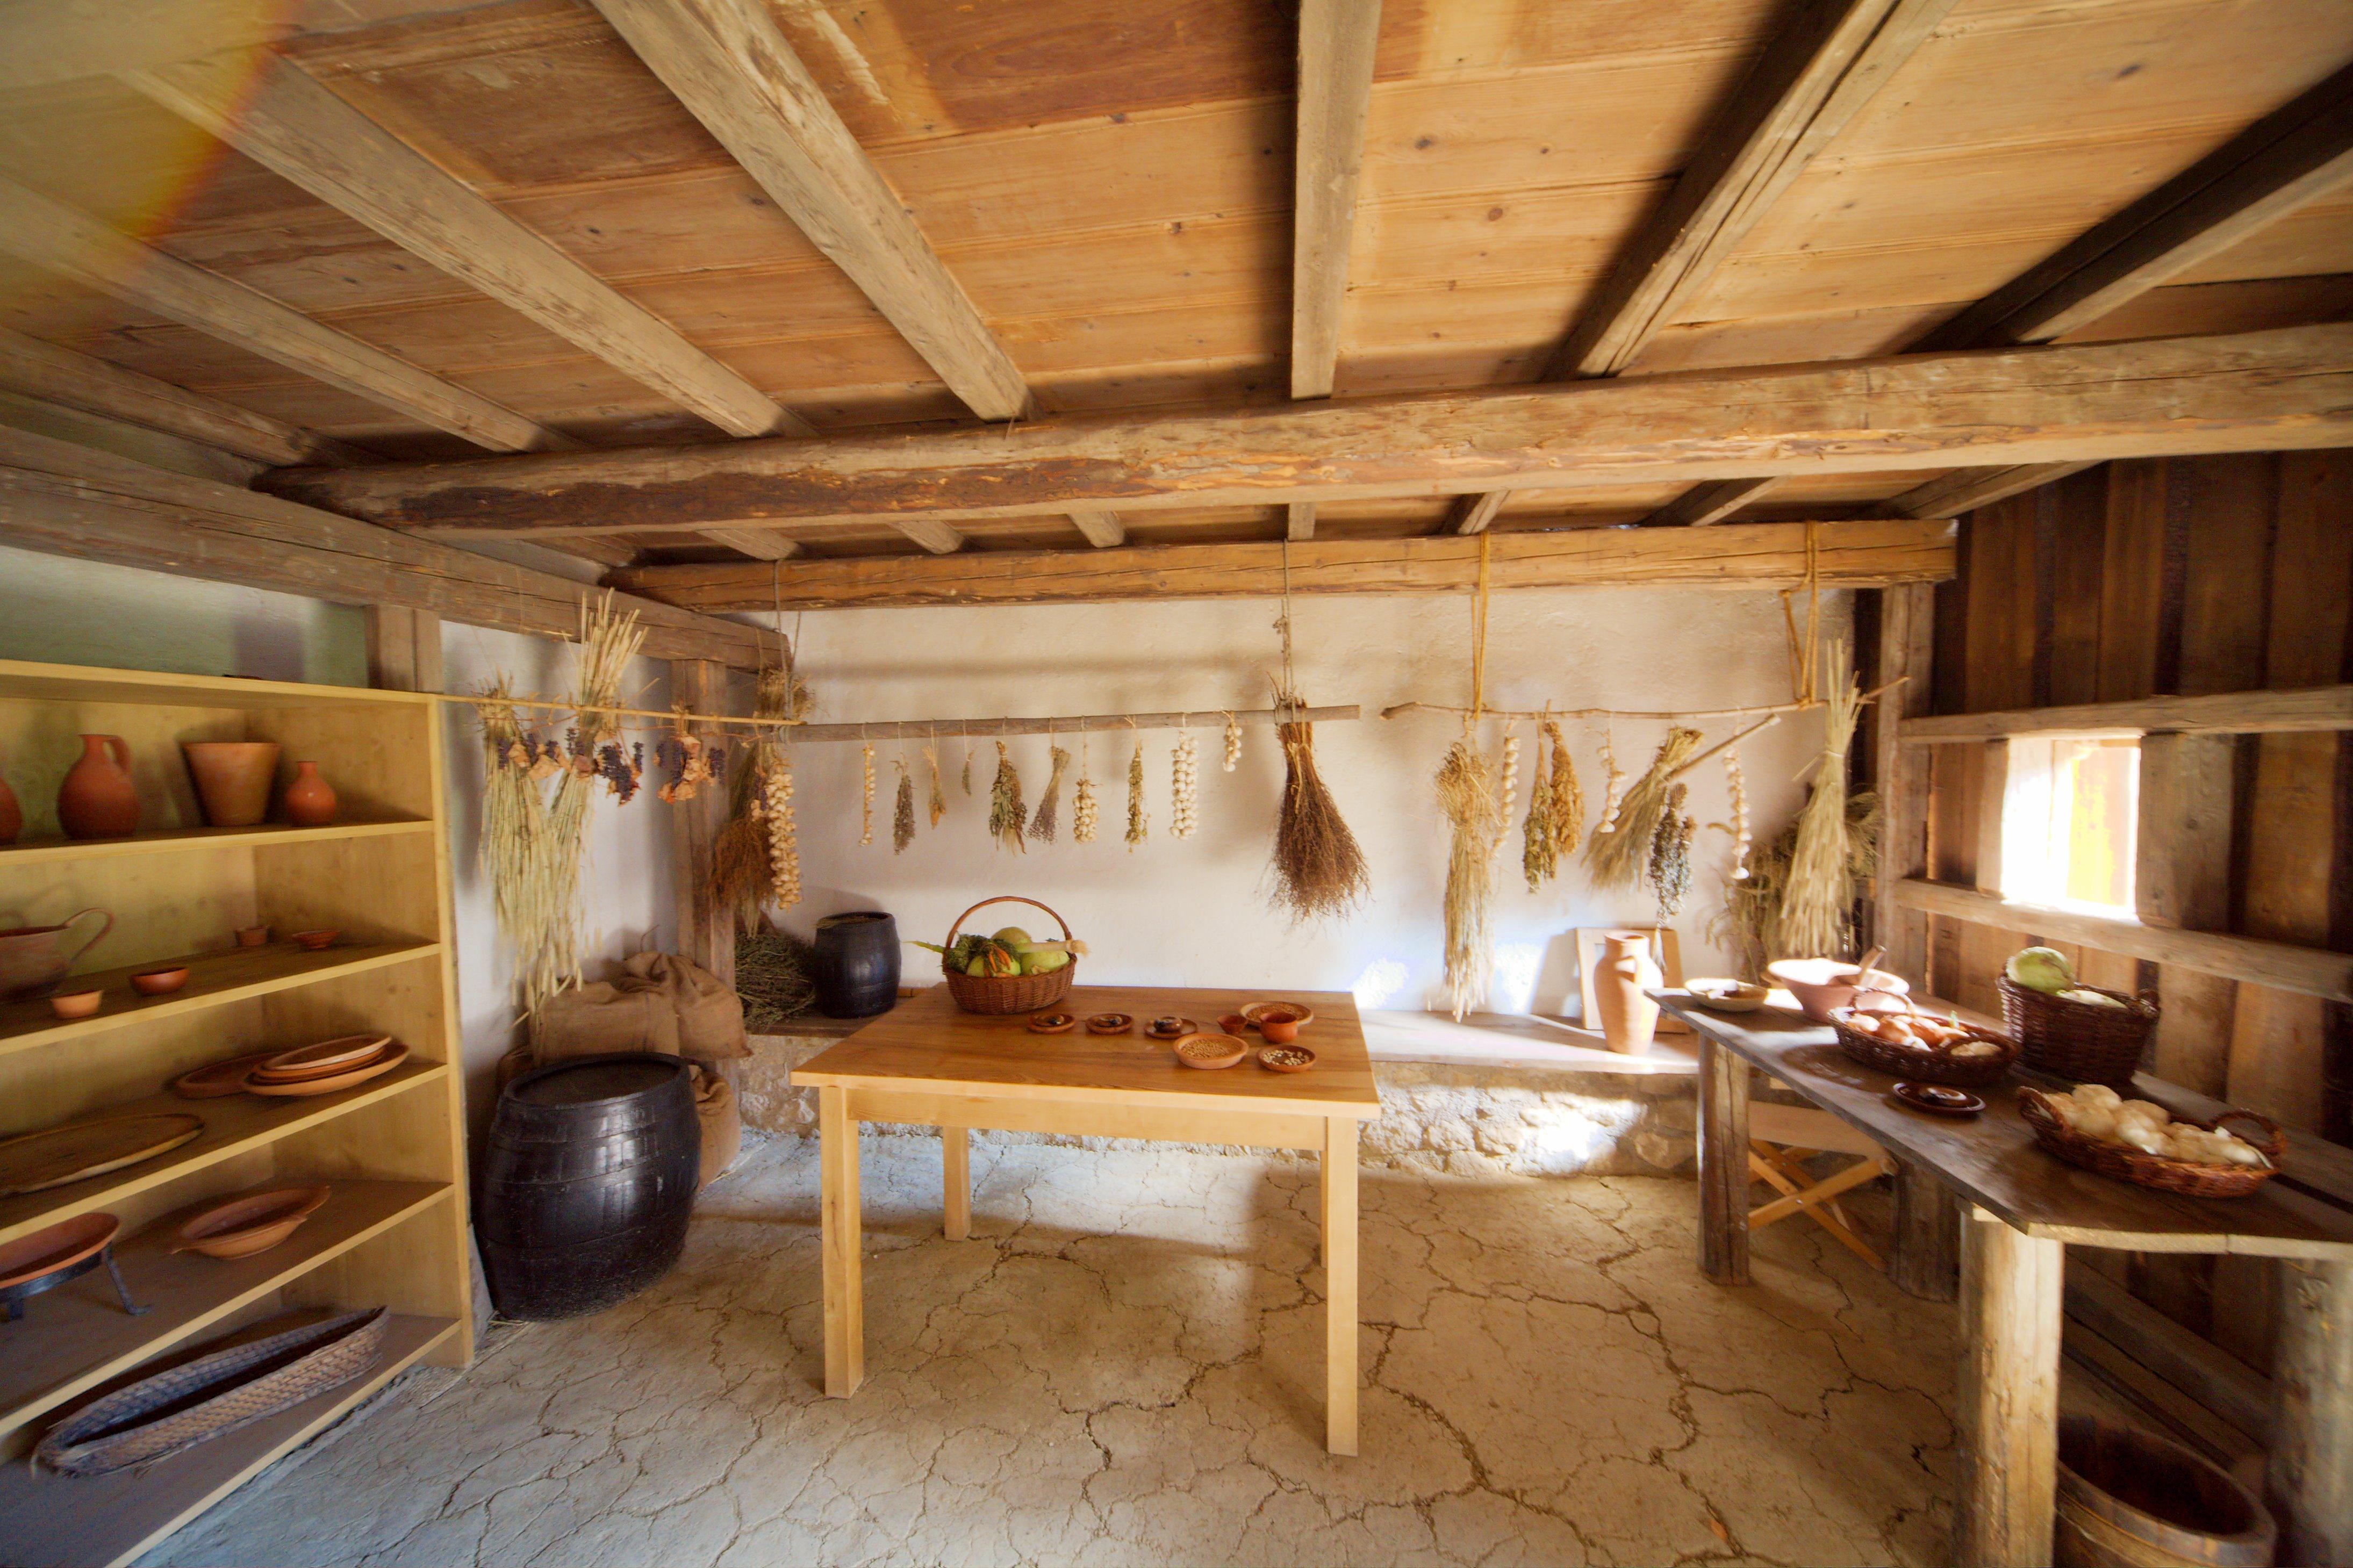 Small Kitchen Eating Area Ideas